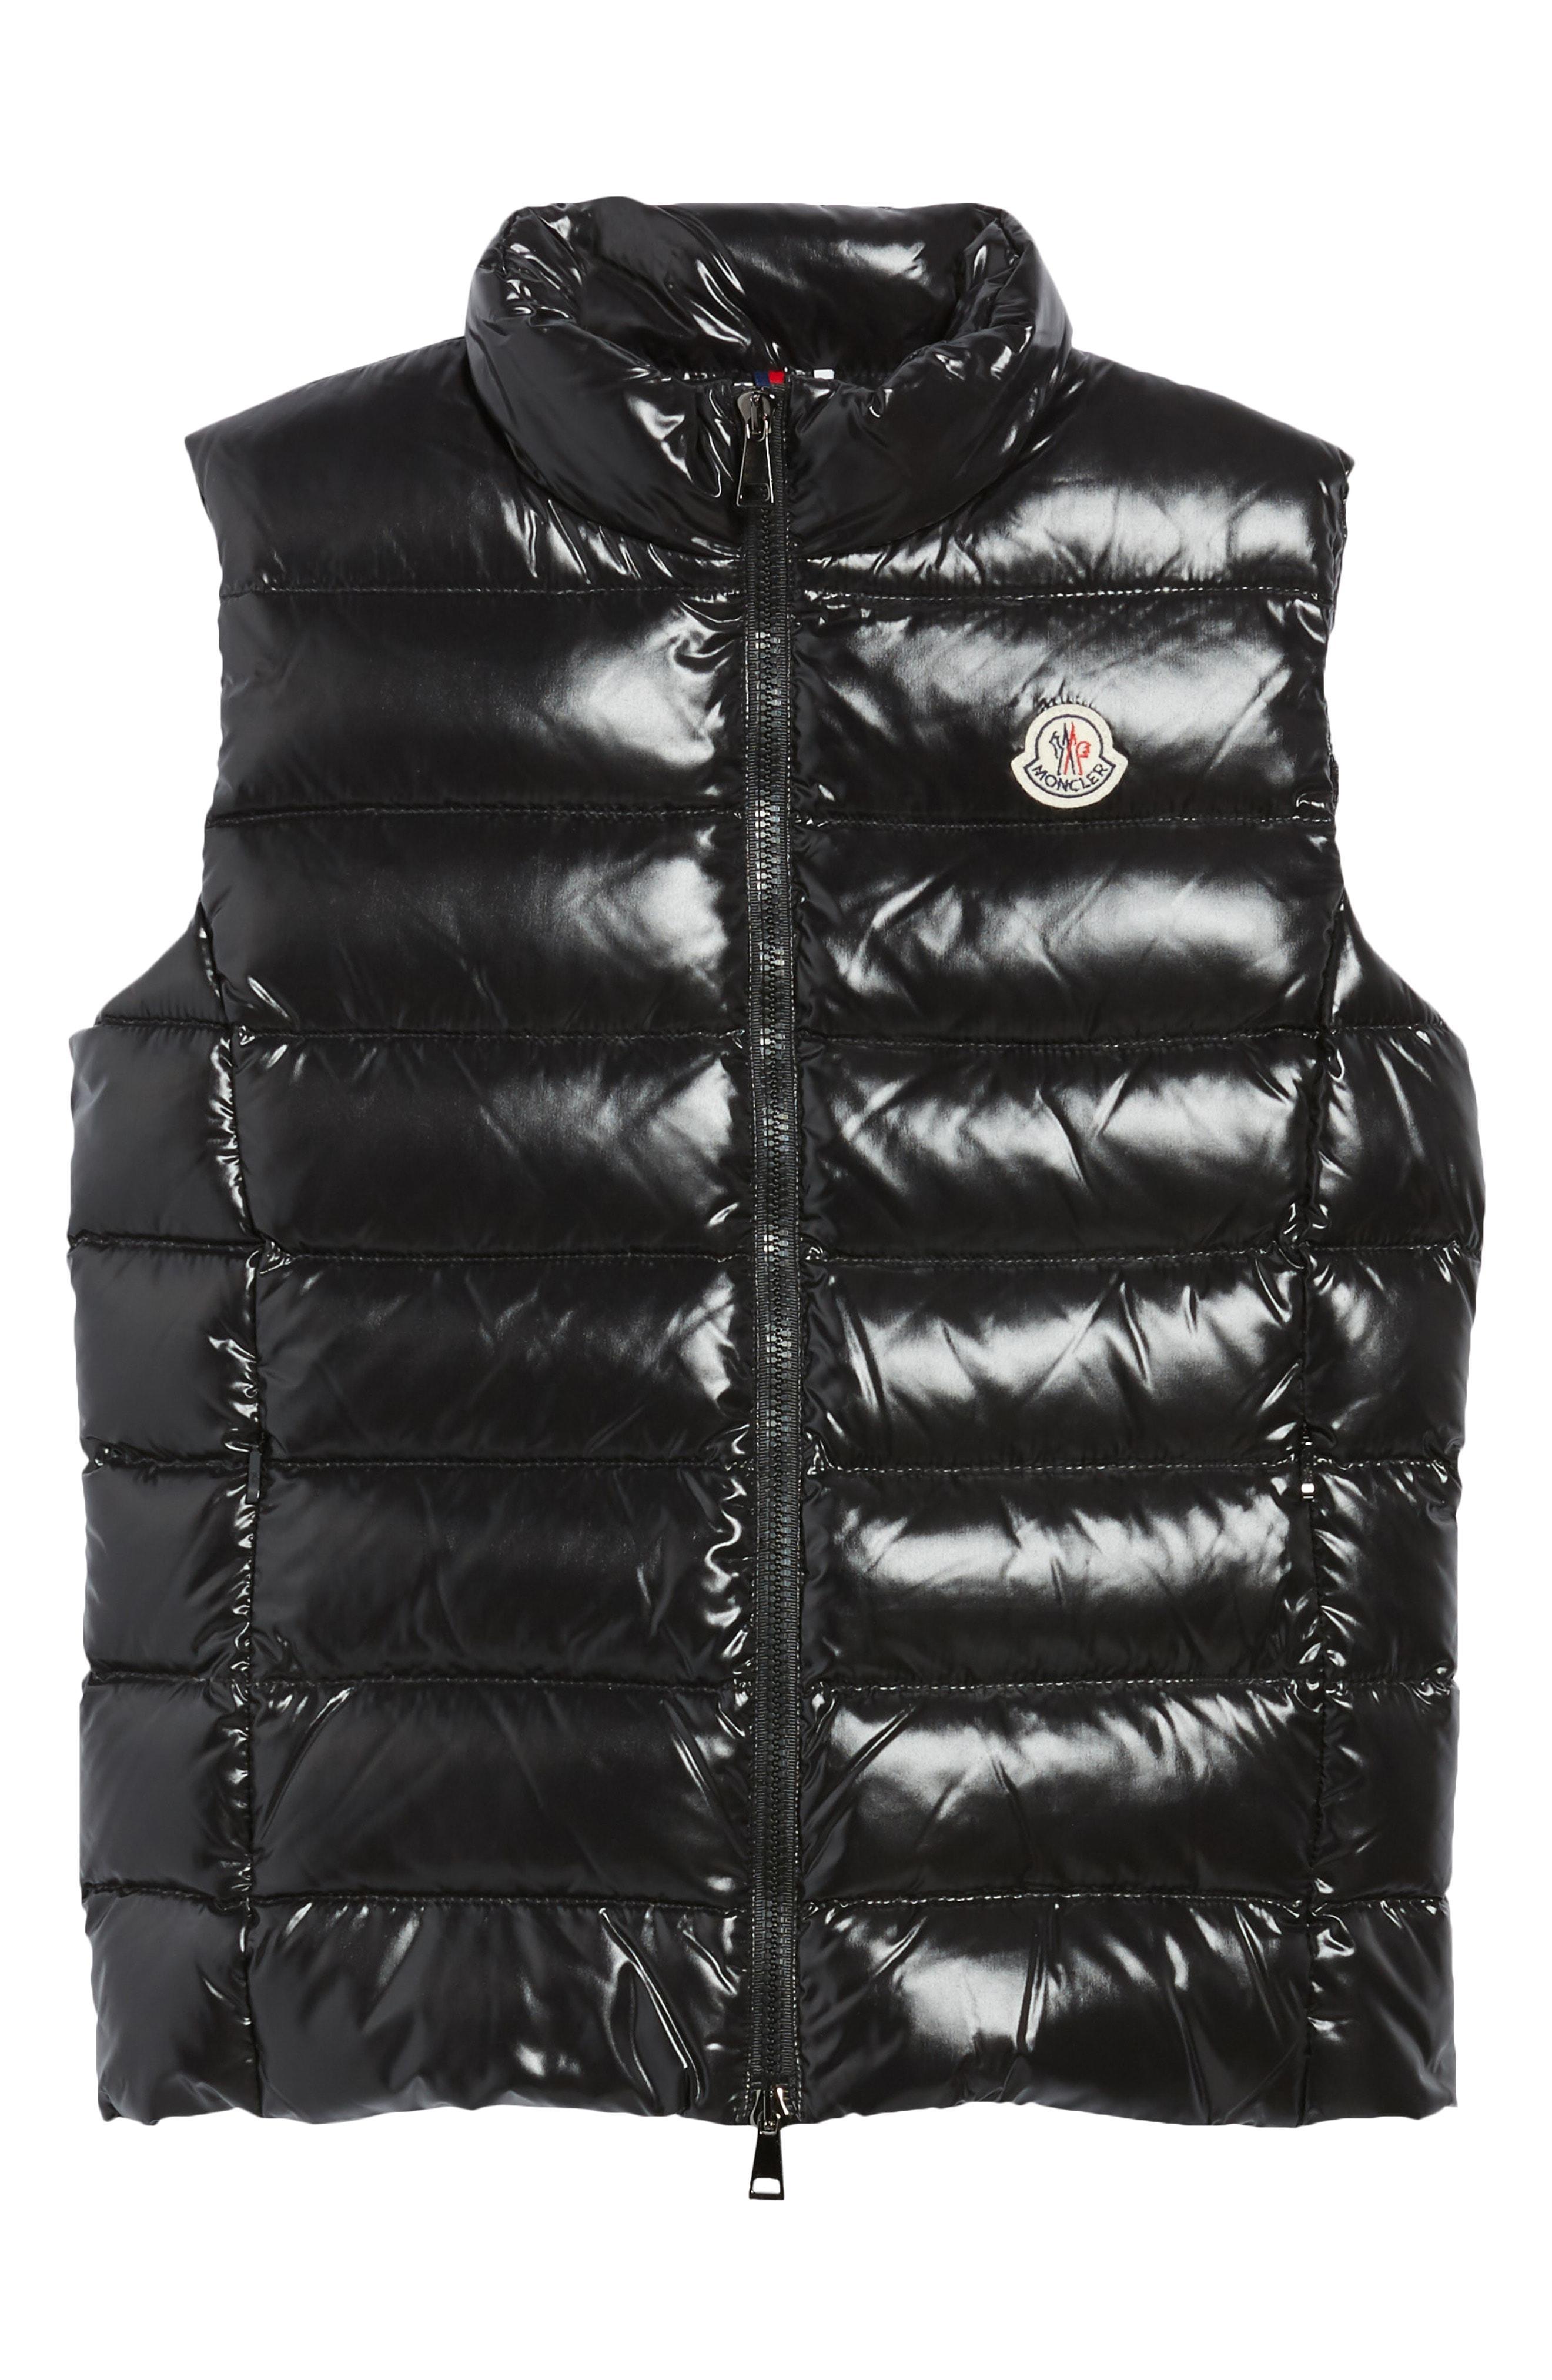 2b0e40c70 Lyst - Moncler Girl s Ghany Down Puffer Vest - Save 58%